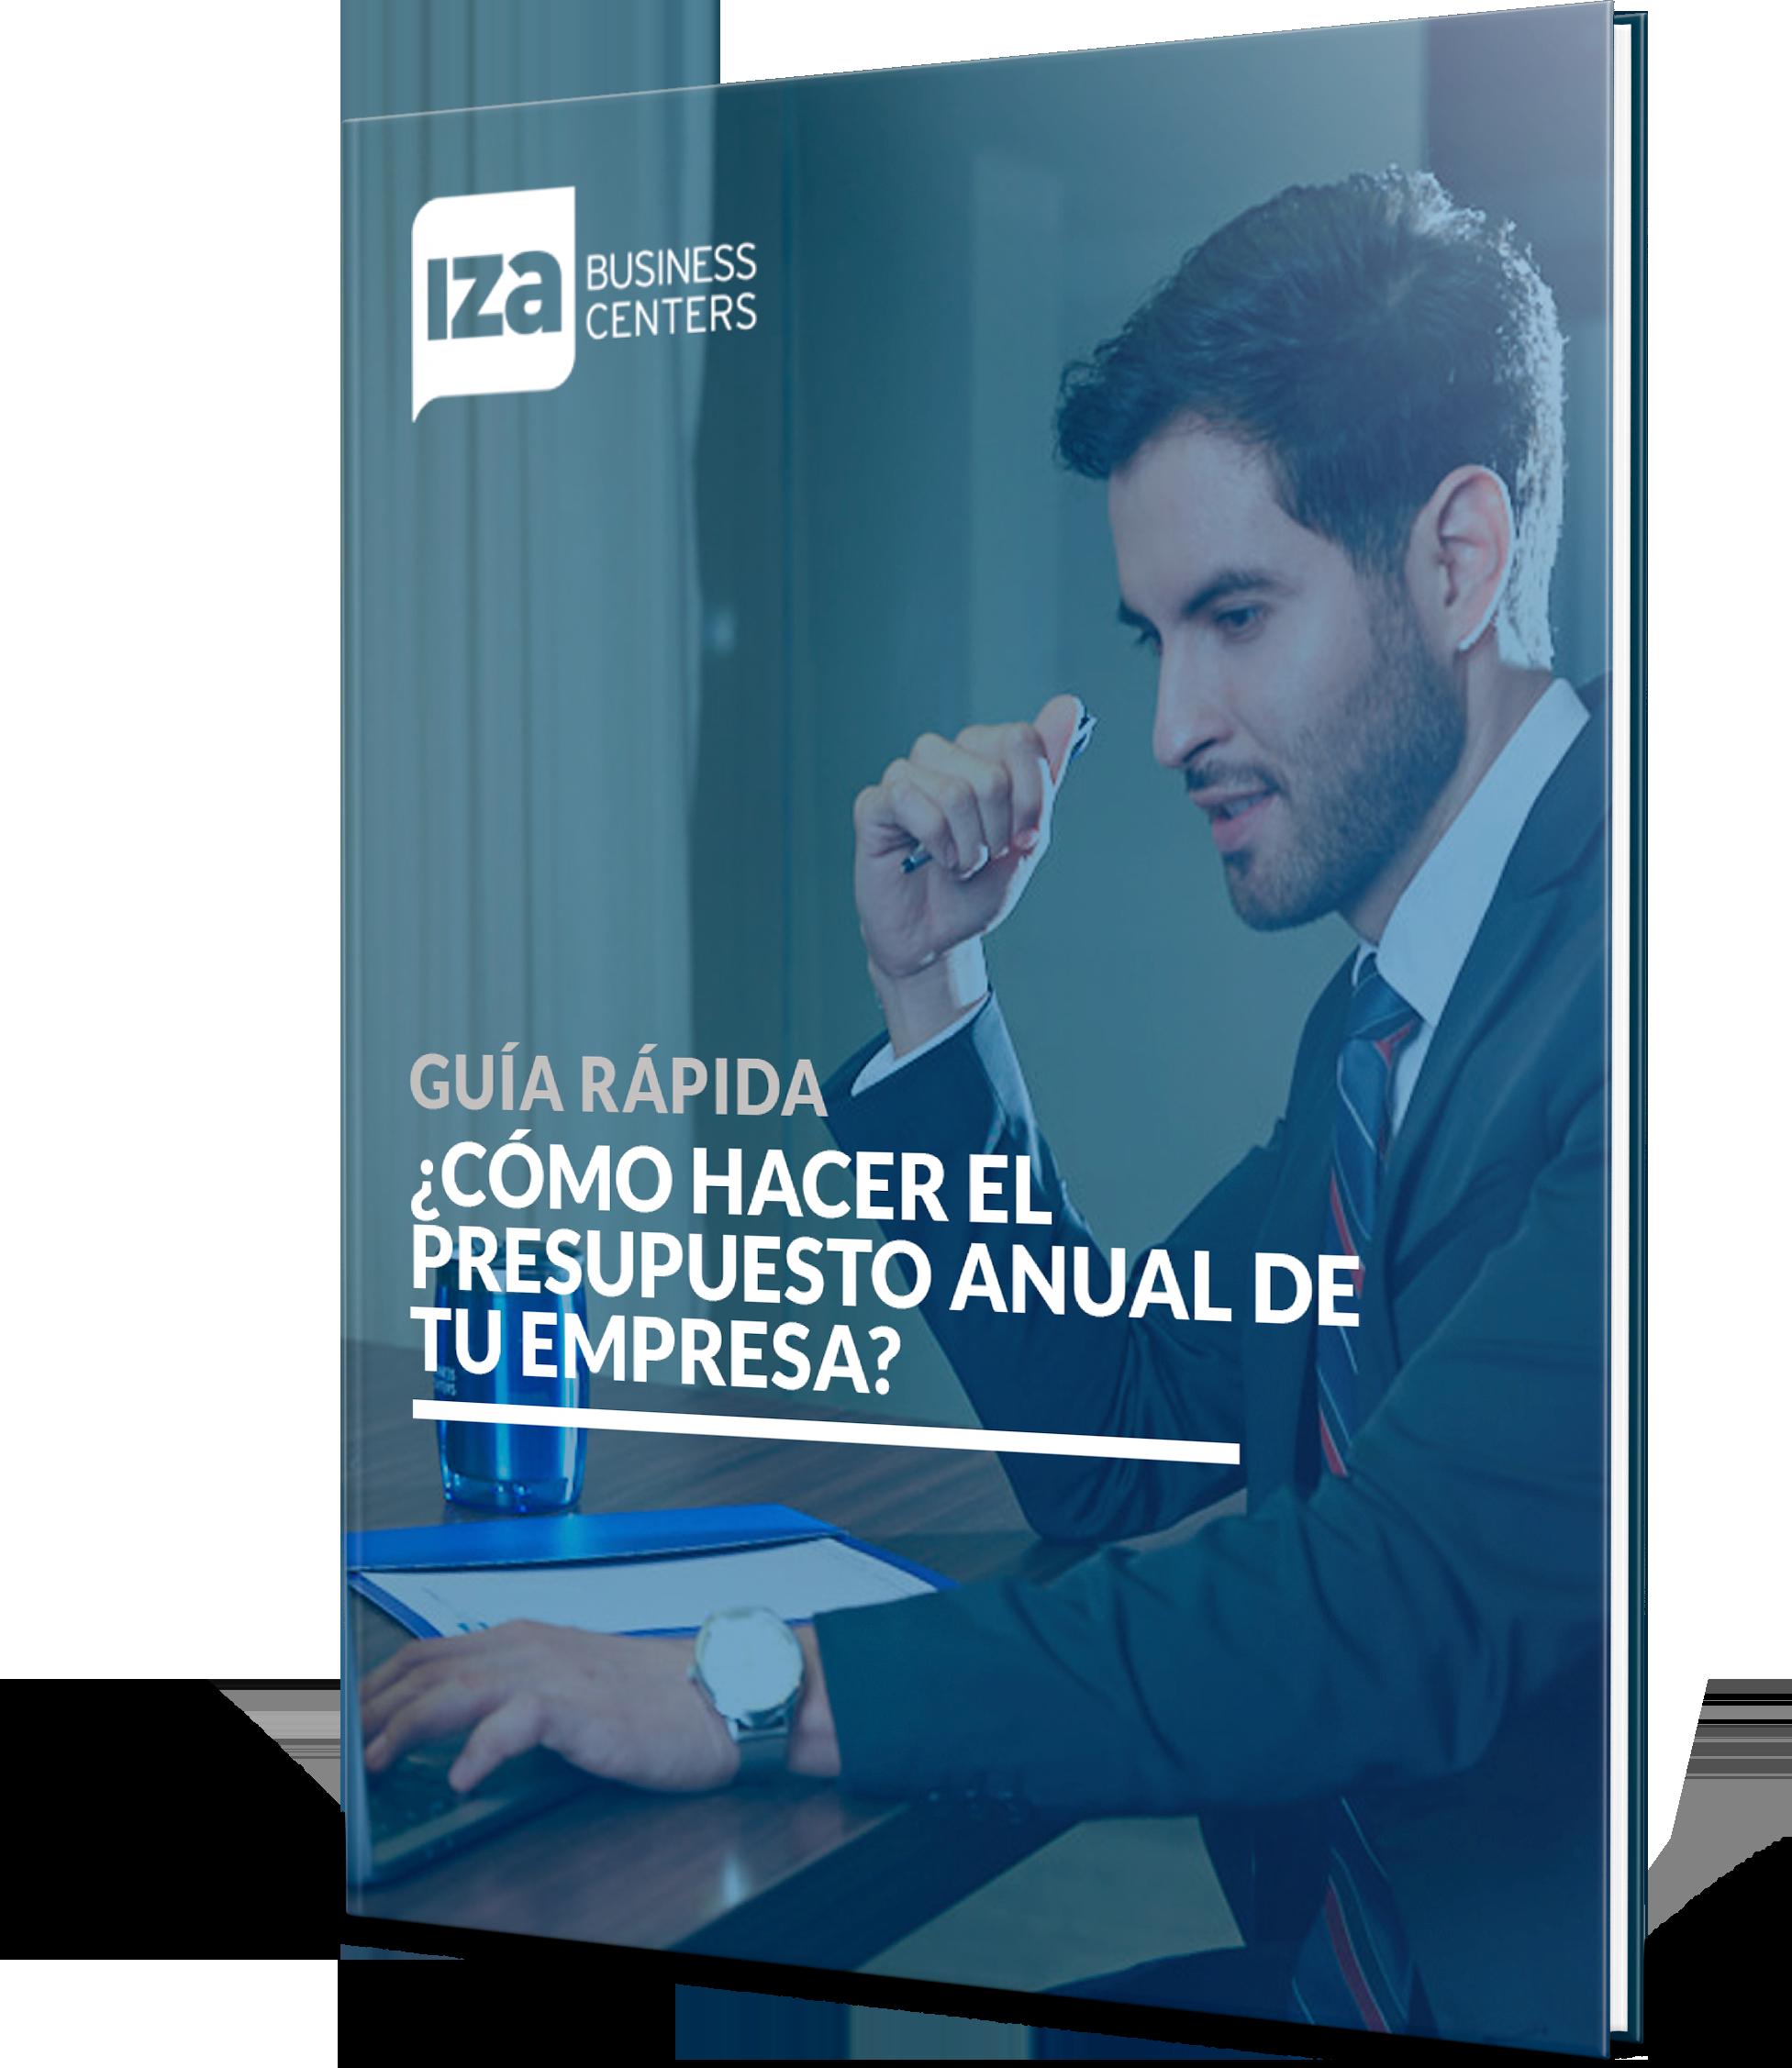 Mockup_IZABC_Presupuesto-anual